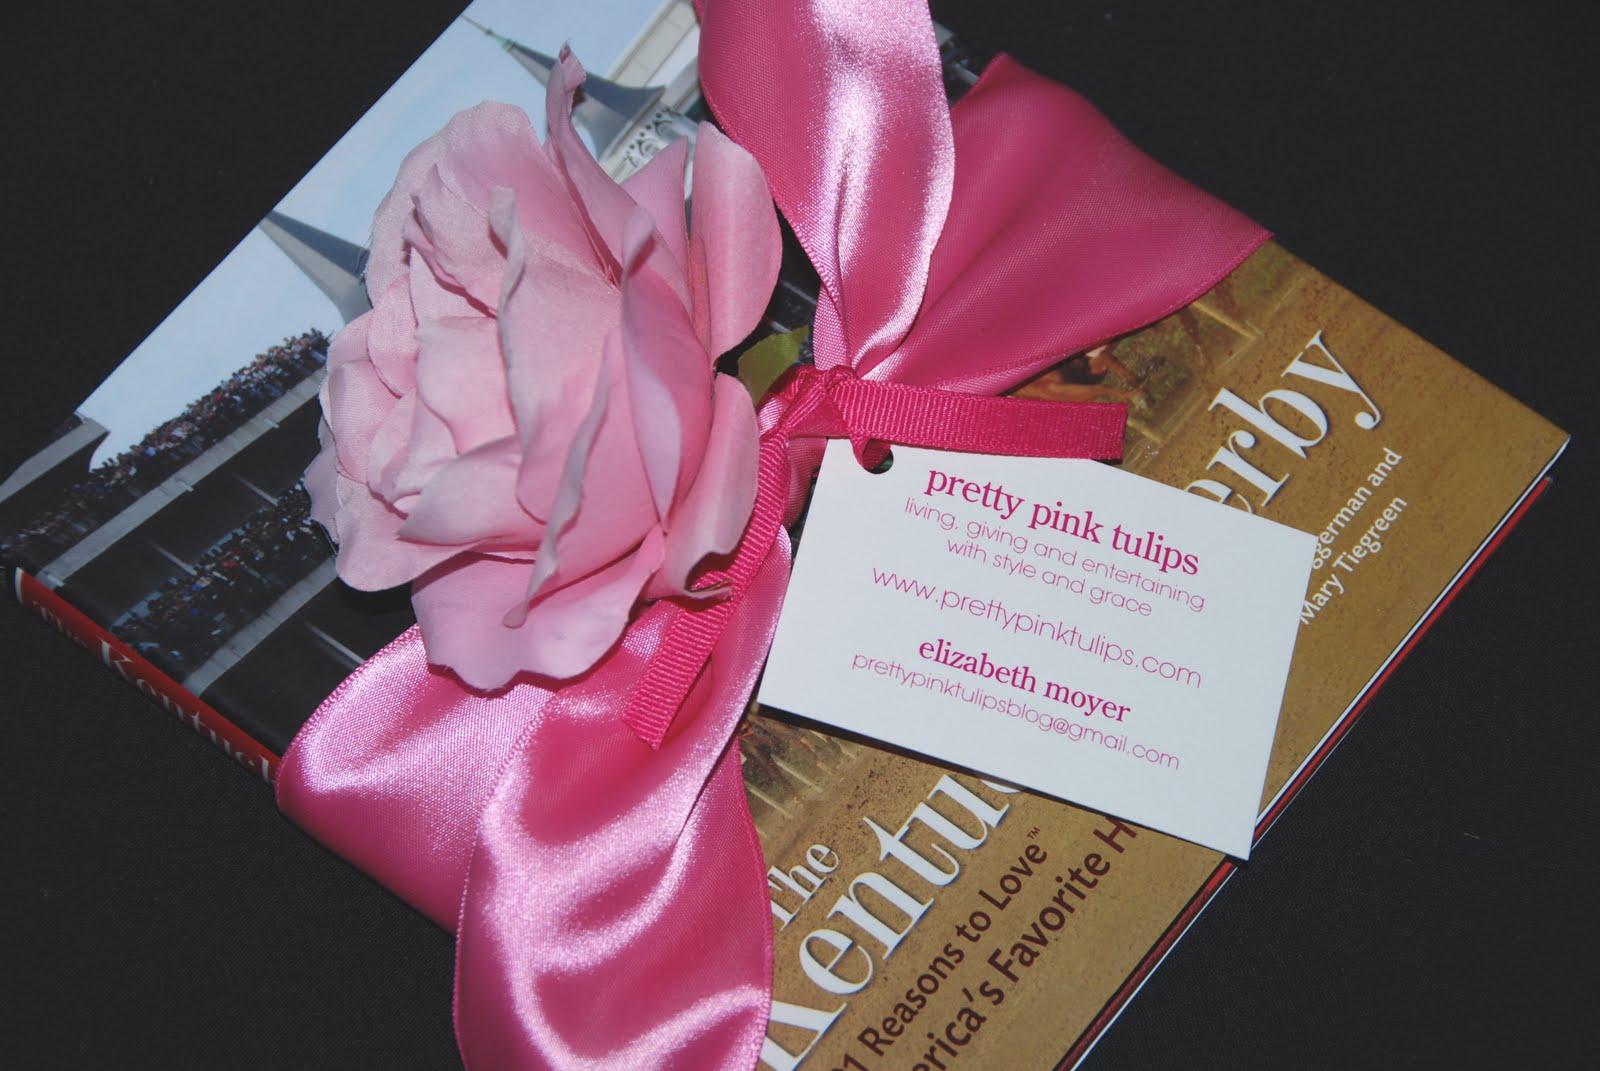 Pretty Pink Ribbon Ribbon And a Pink Rose